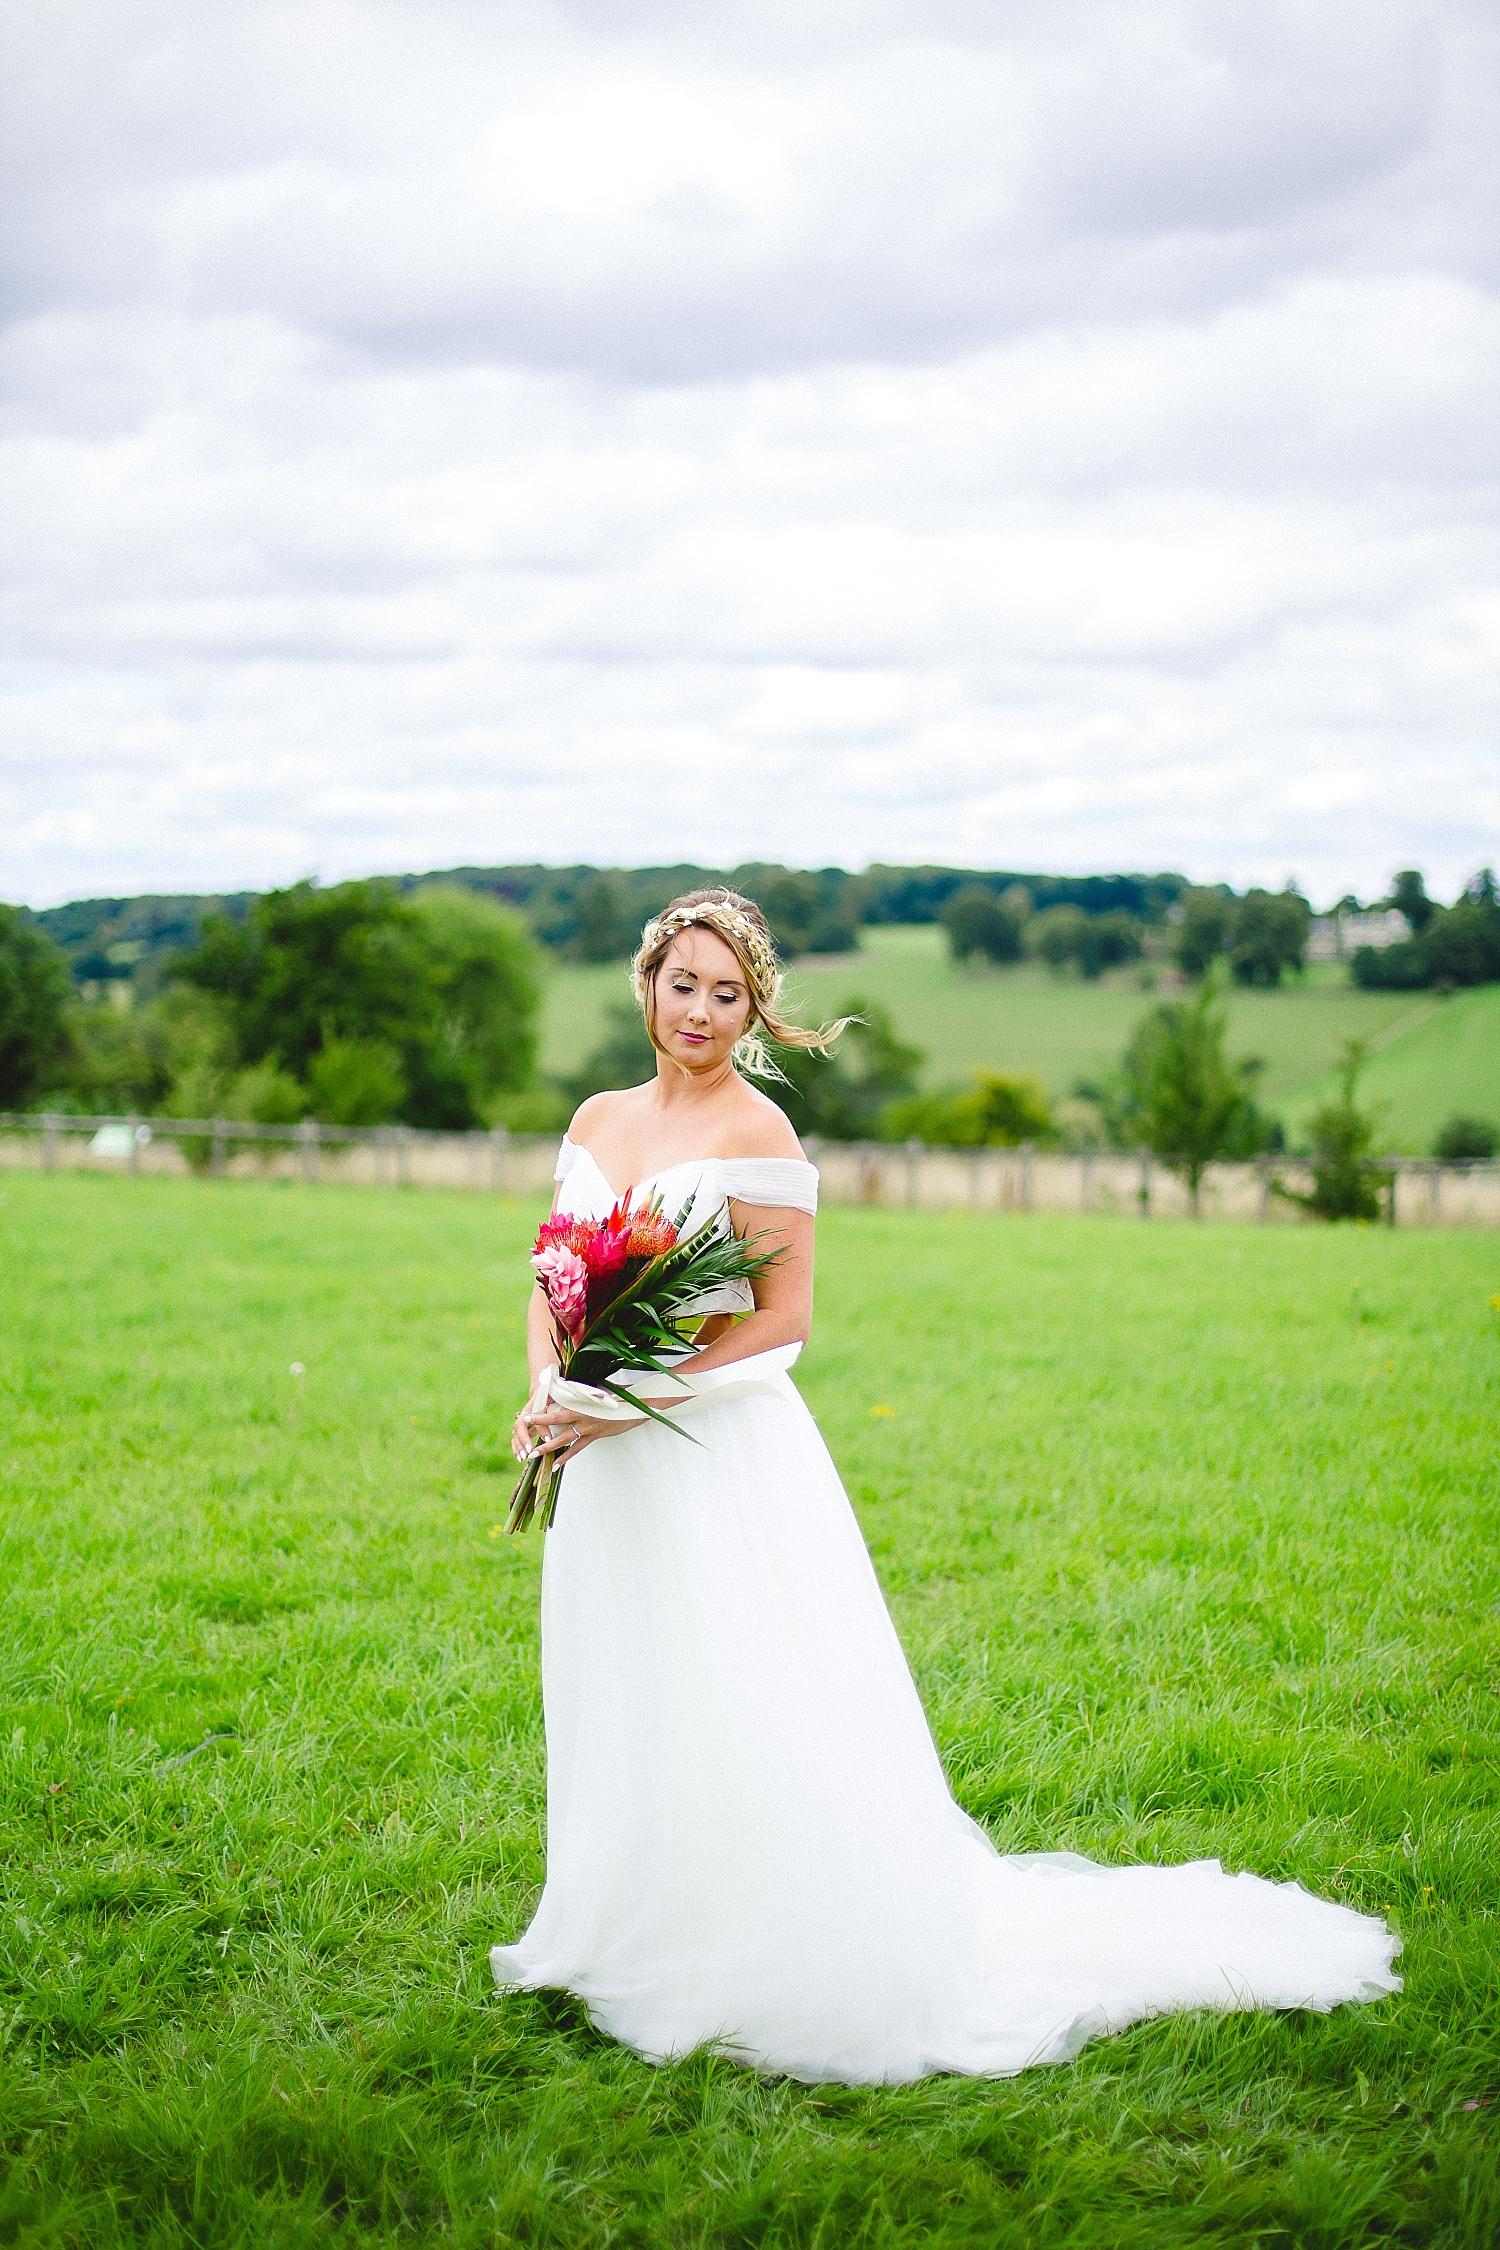 North-Hill-Farm-Wedding-Photographer_0069.jpg